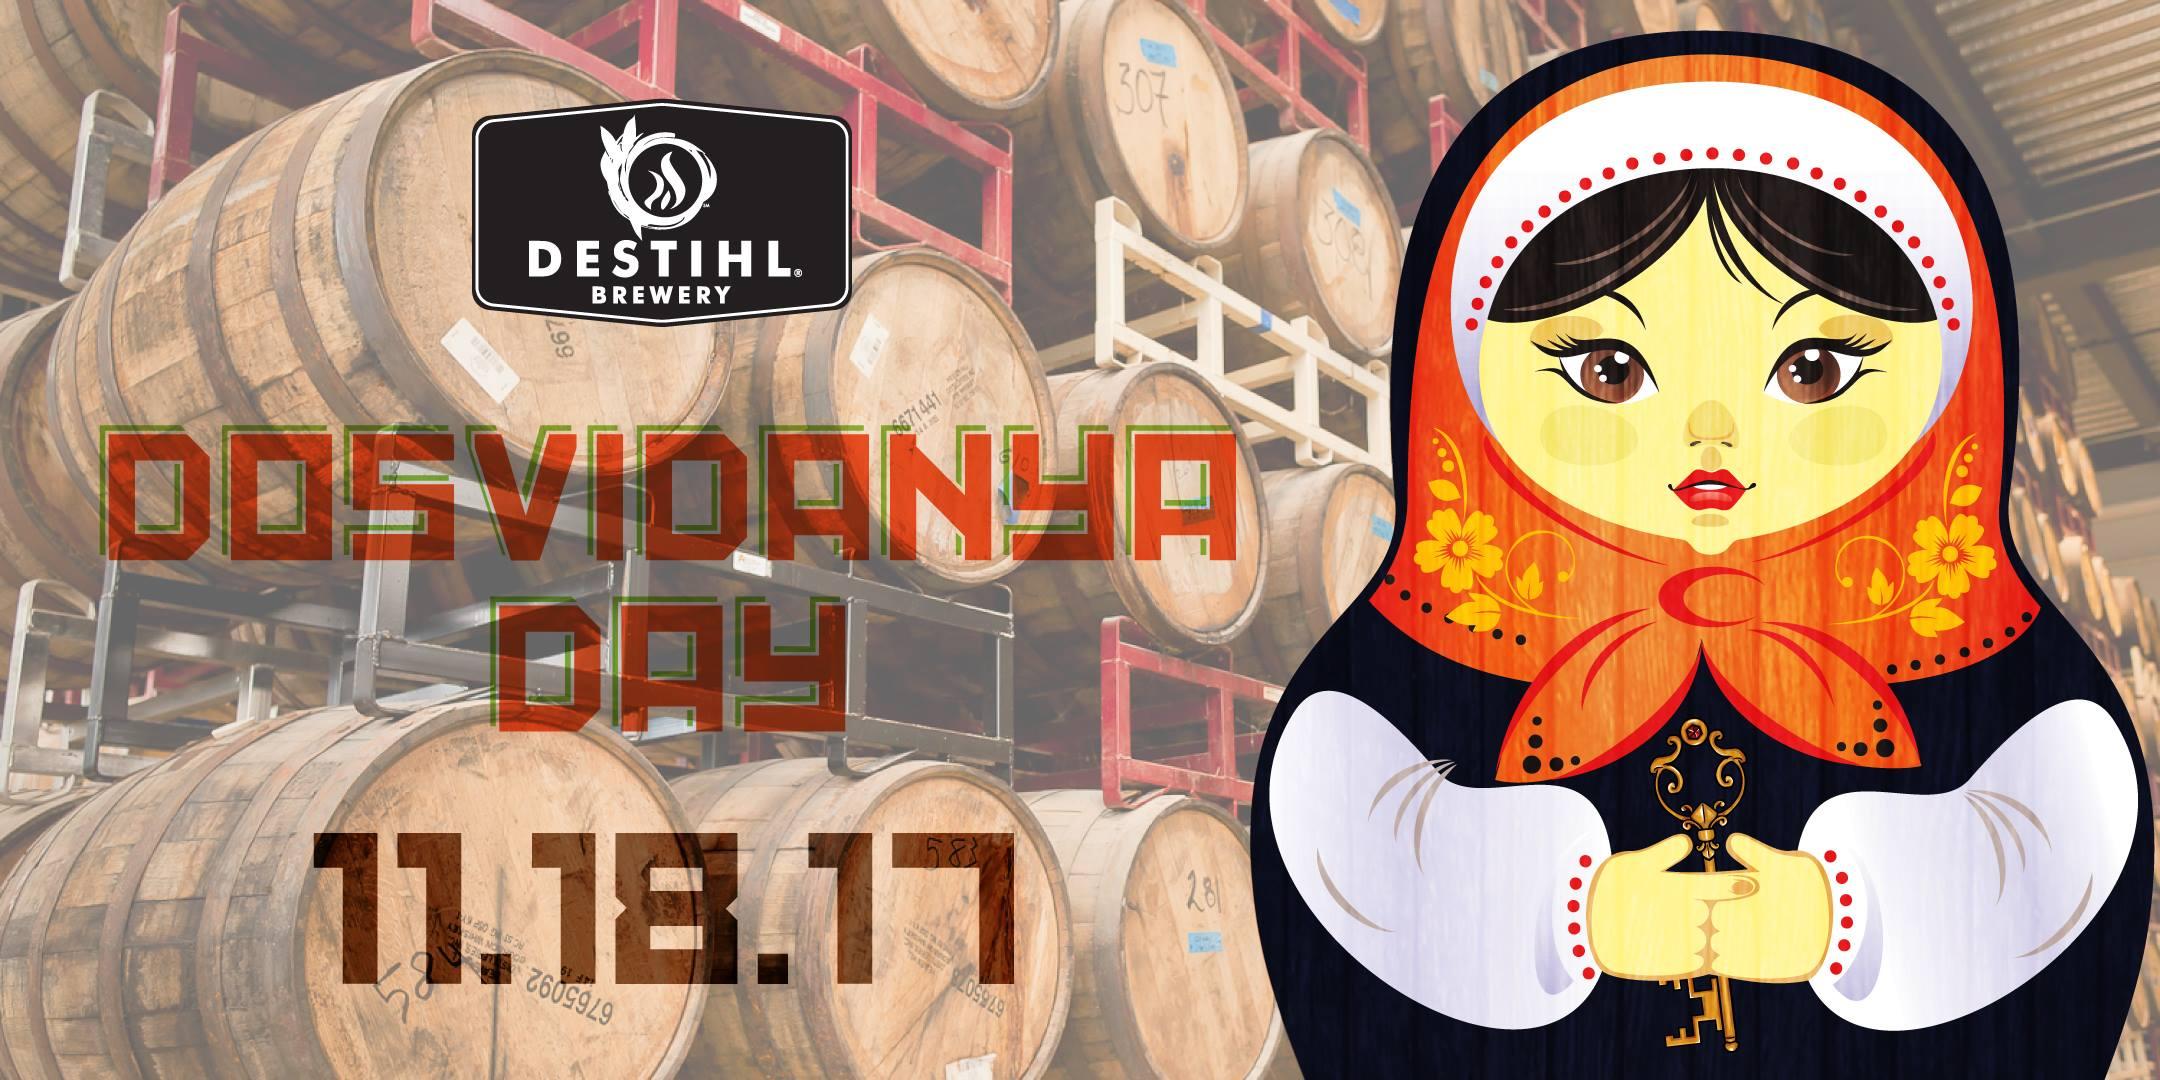 Destihl Brewery - Dosvidanya Day 2017